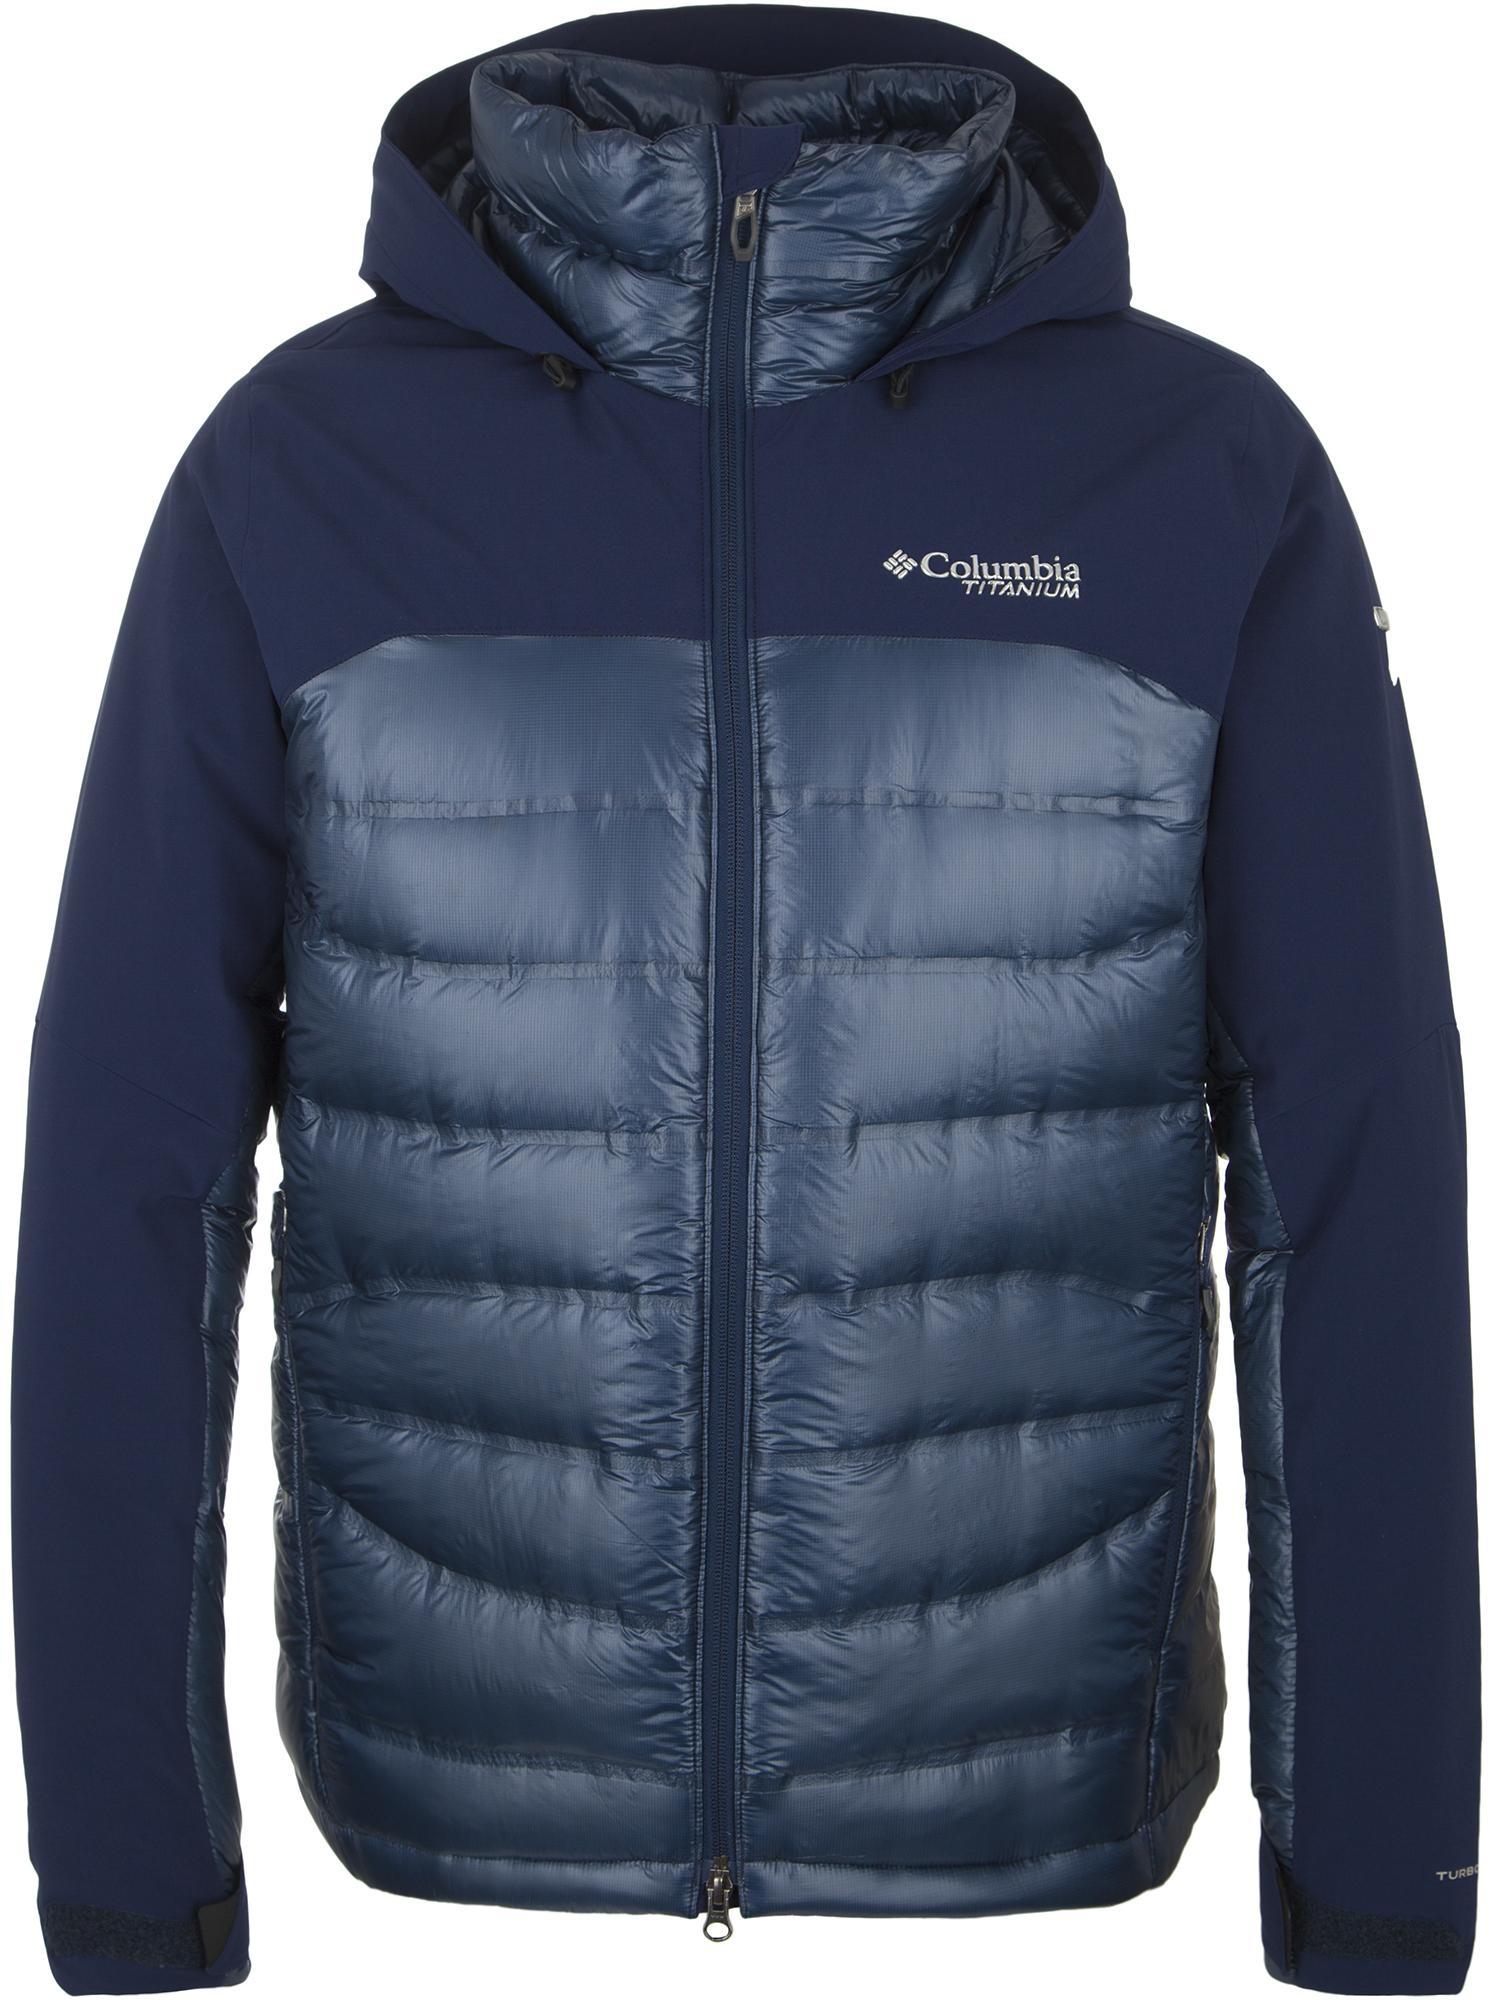 Columbia Куртка пуховая мужская Heatzone 1000 TurboDown II, размер 48-50